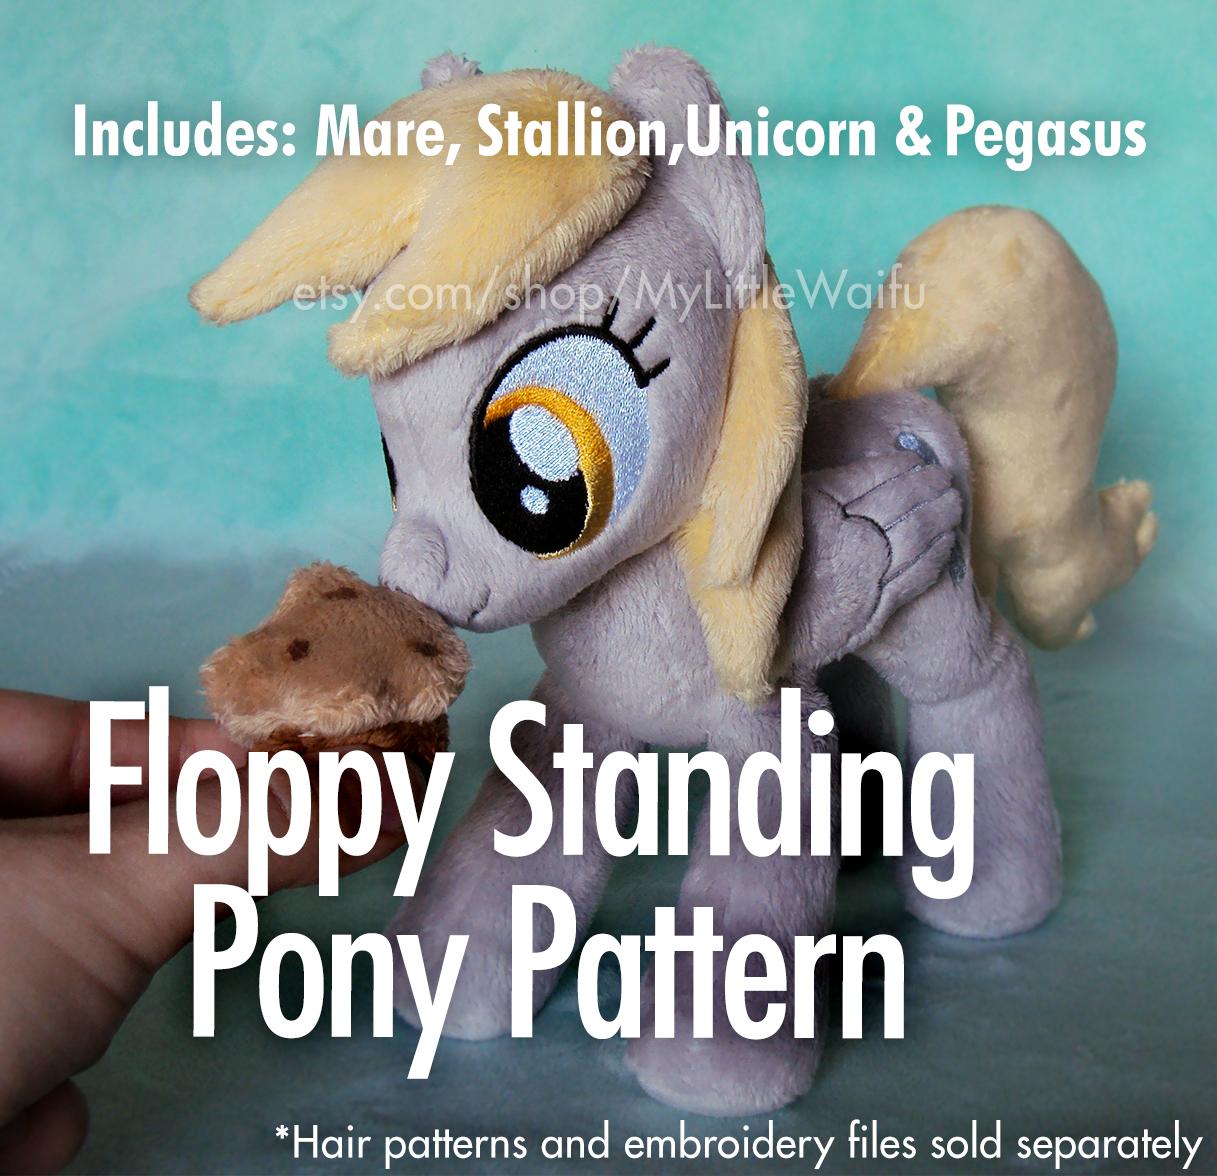 Floppy Standing Pony Pattern by ButtercupBabyPPG